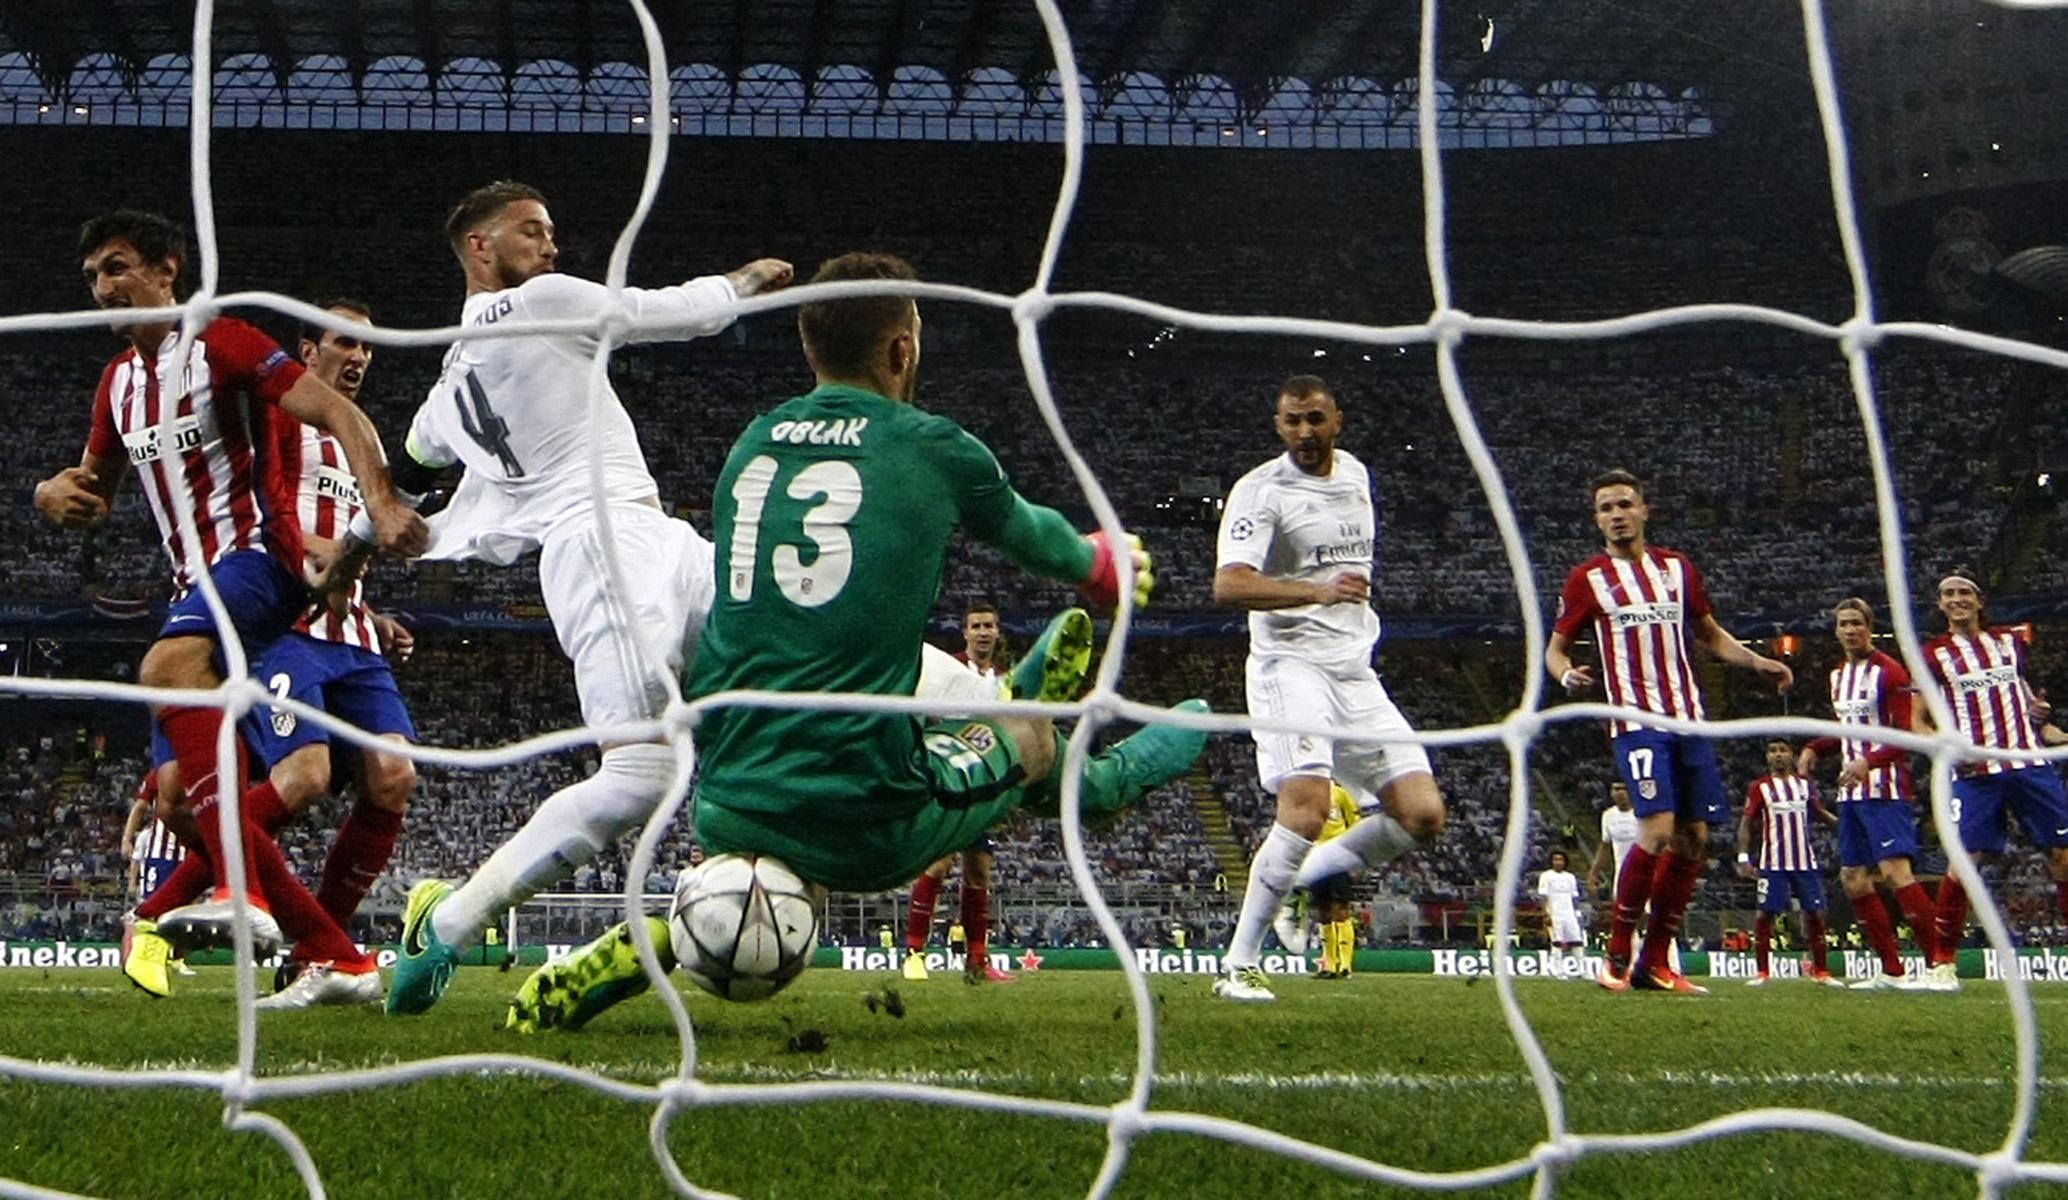 Final Champions LeagueReal Madrid - Atletico Madrid© Alberto R. Roldan / Diario La Razon28 05 2016